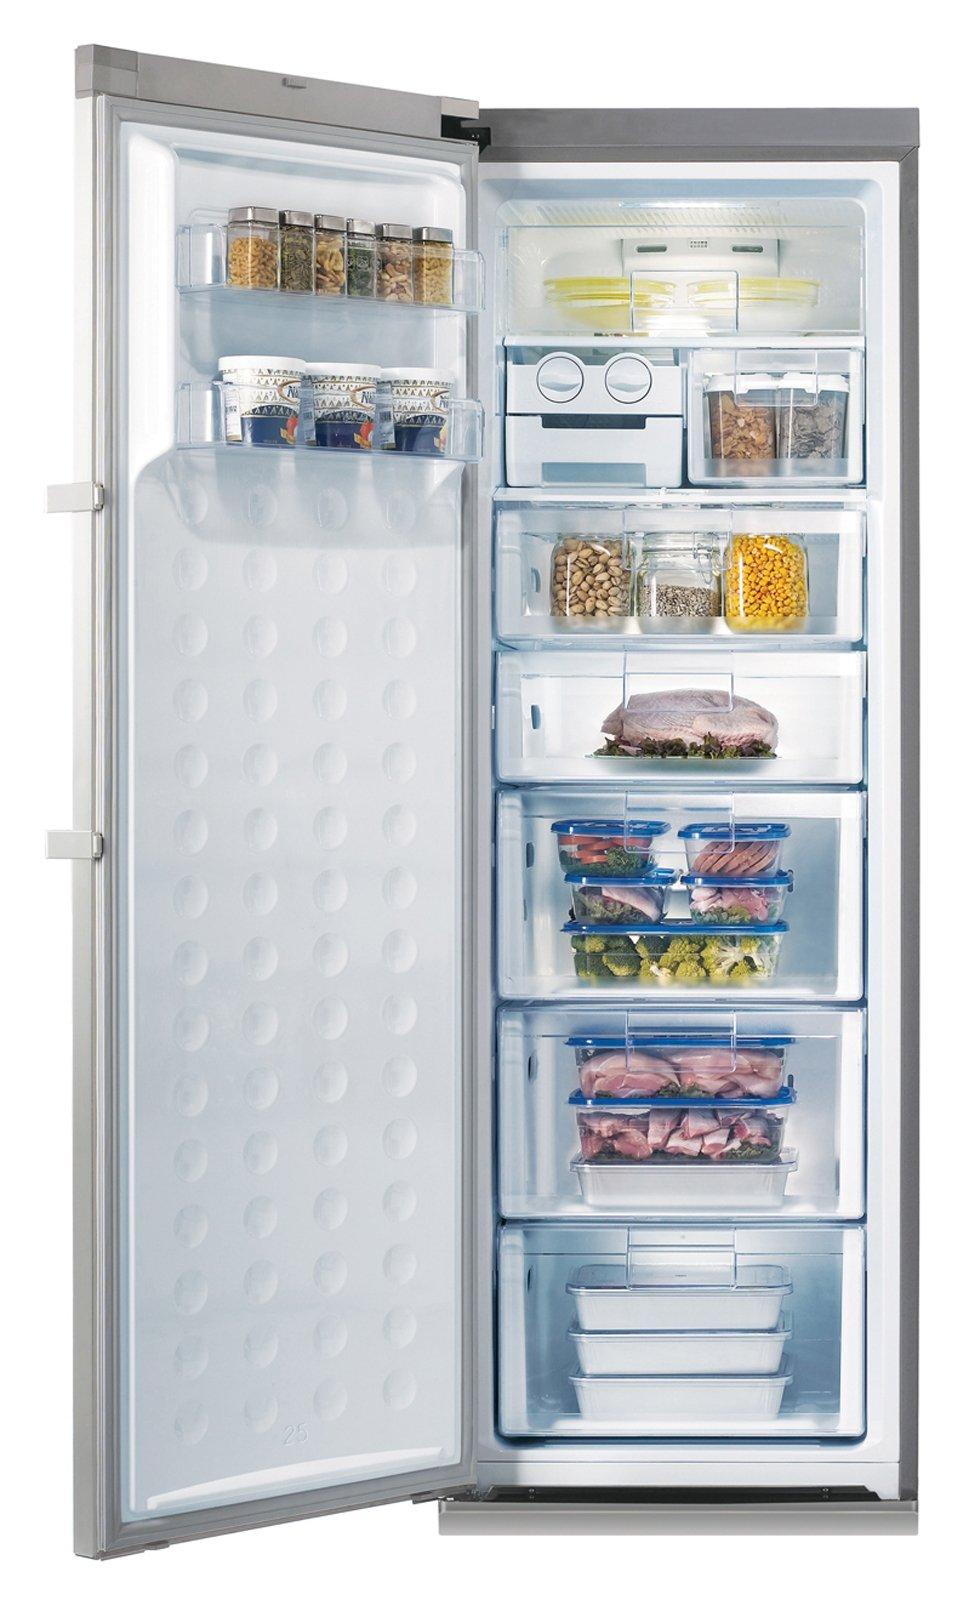 Congelatori da affiancare al frigo cose di casa - Temperatura freezer casa ...